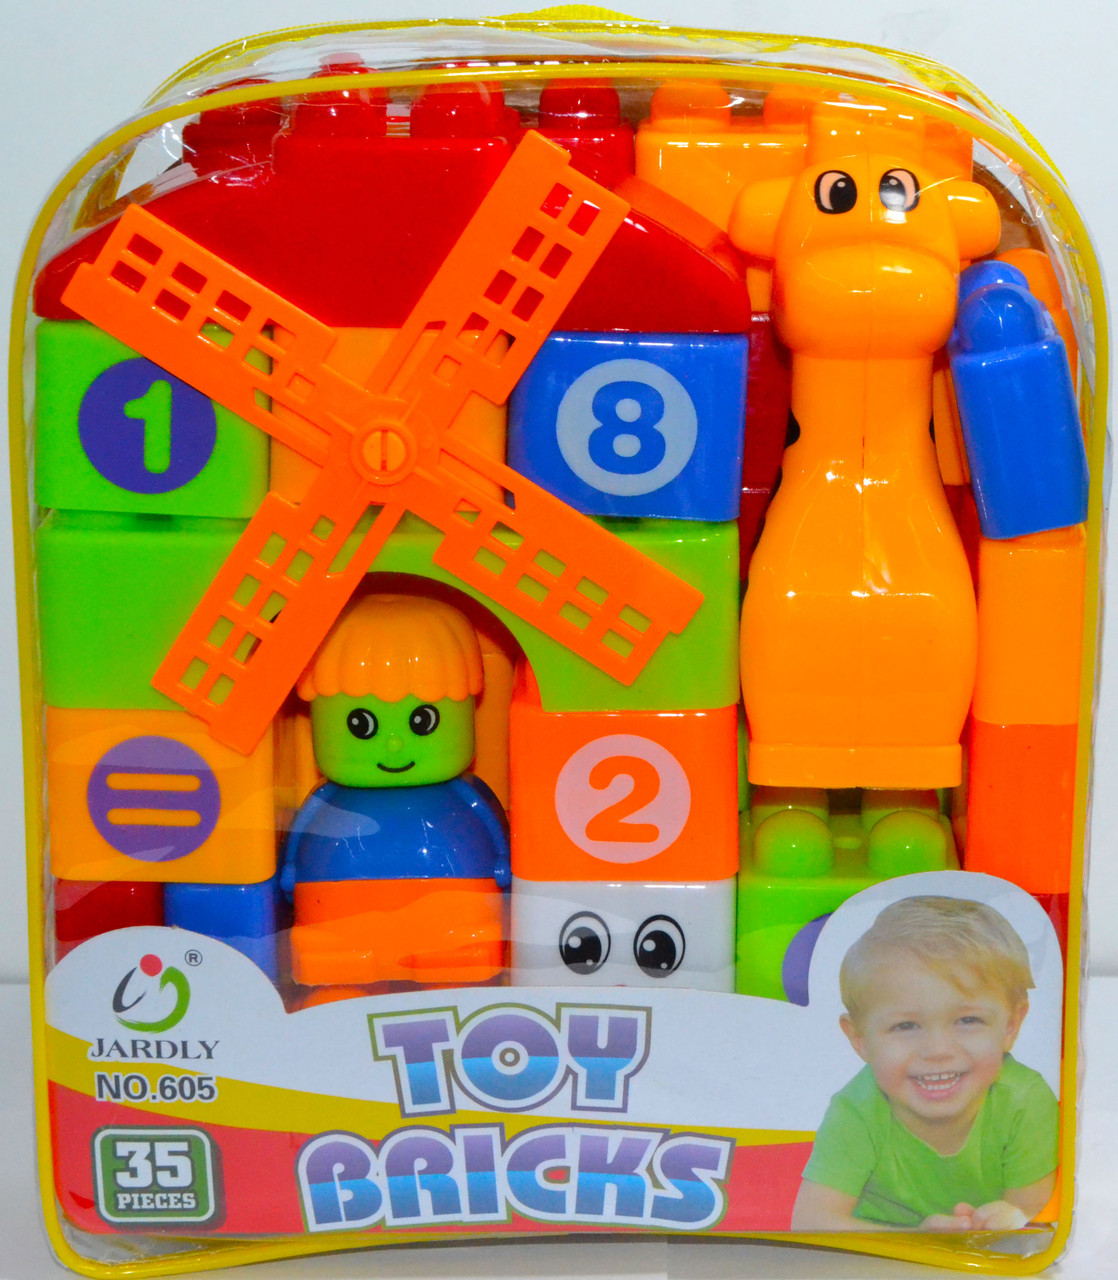 605 Конструктор Toy bricks мельница 35 аксес. 20*18см